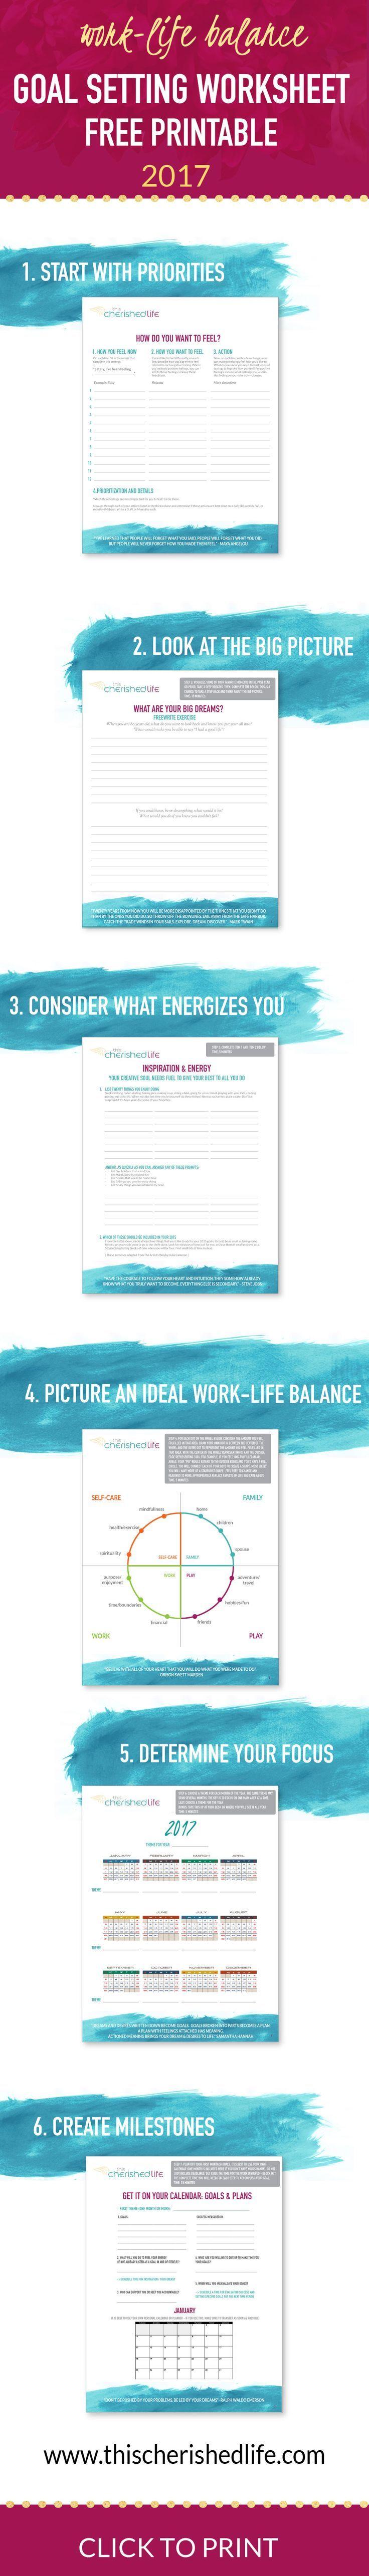 FREE 2017 goal setting printable worksheet - Set goals that matter ...